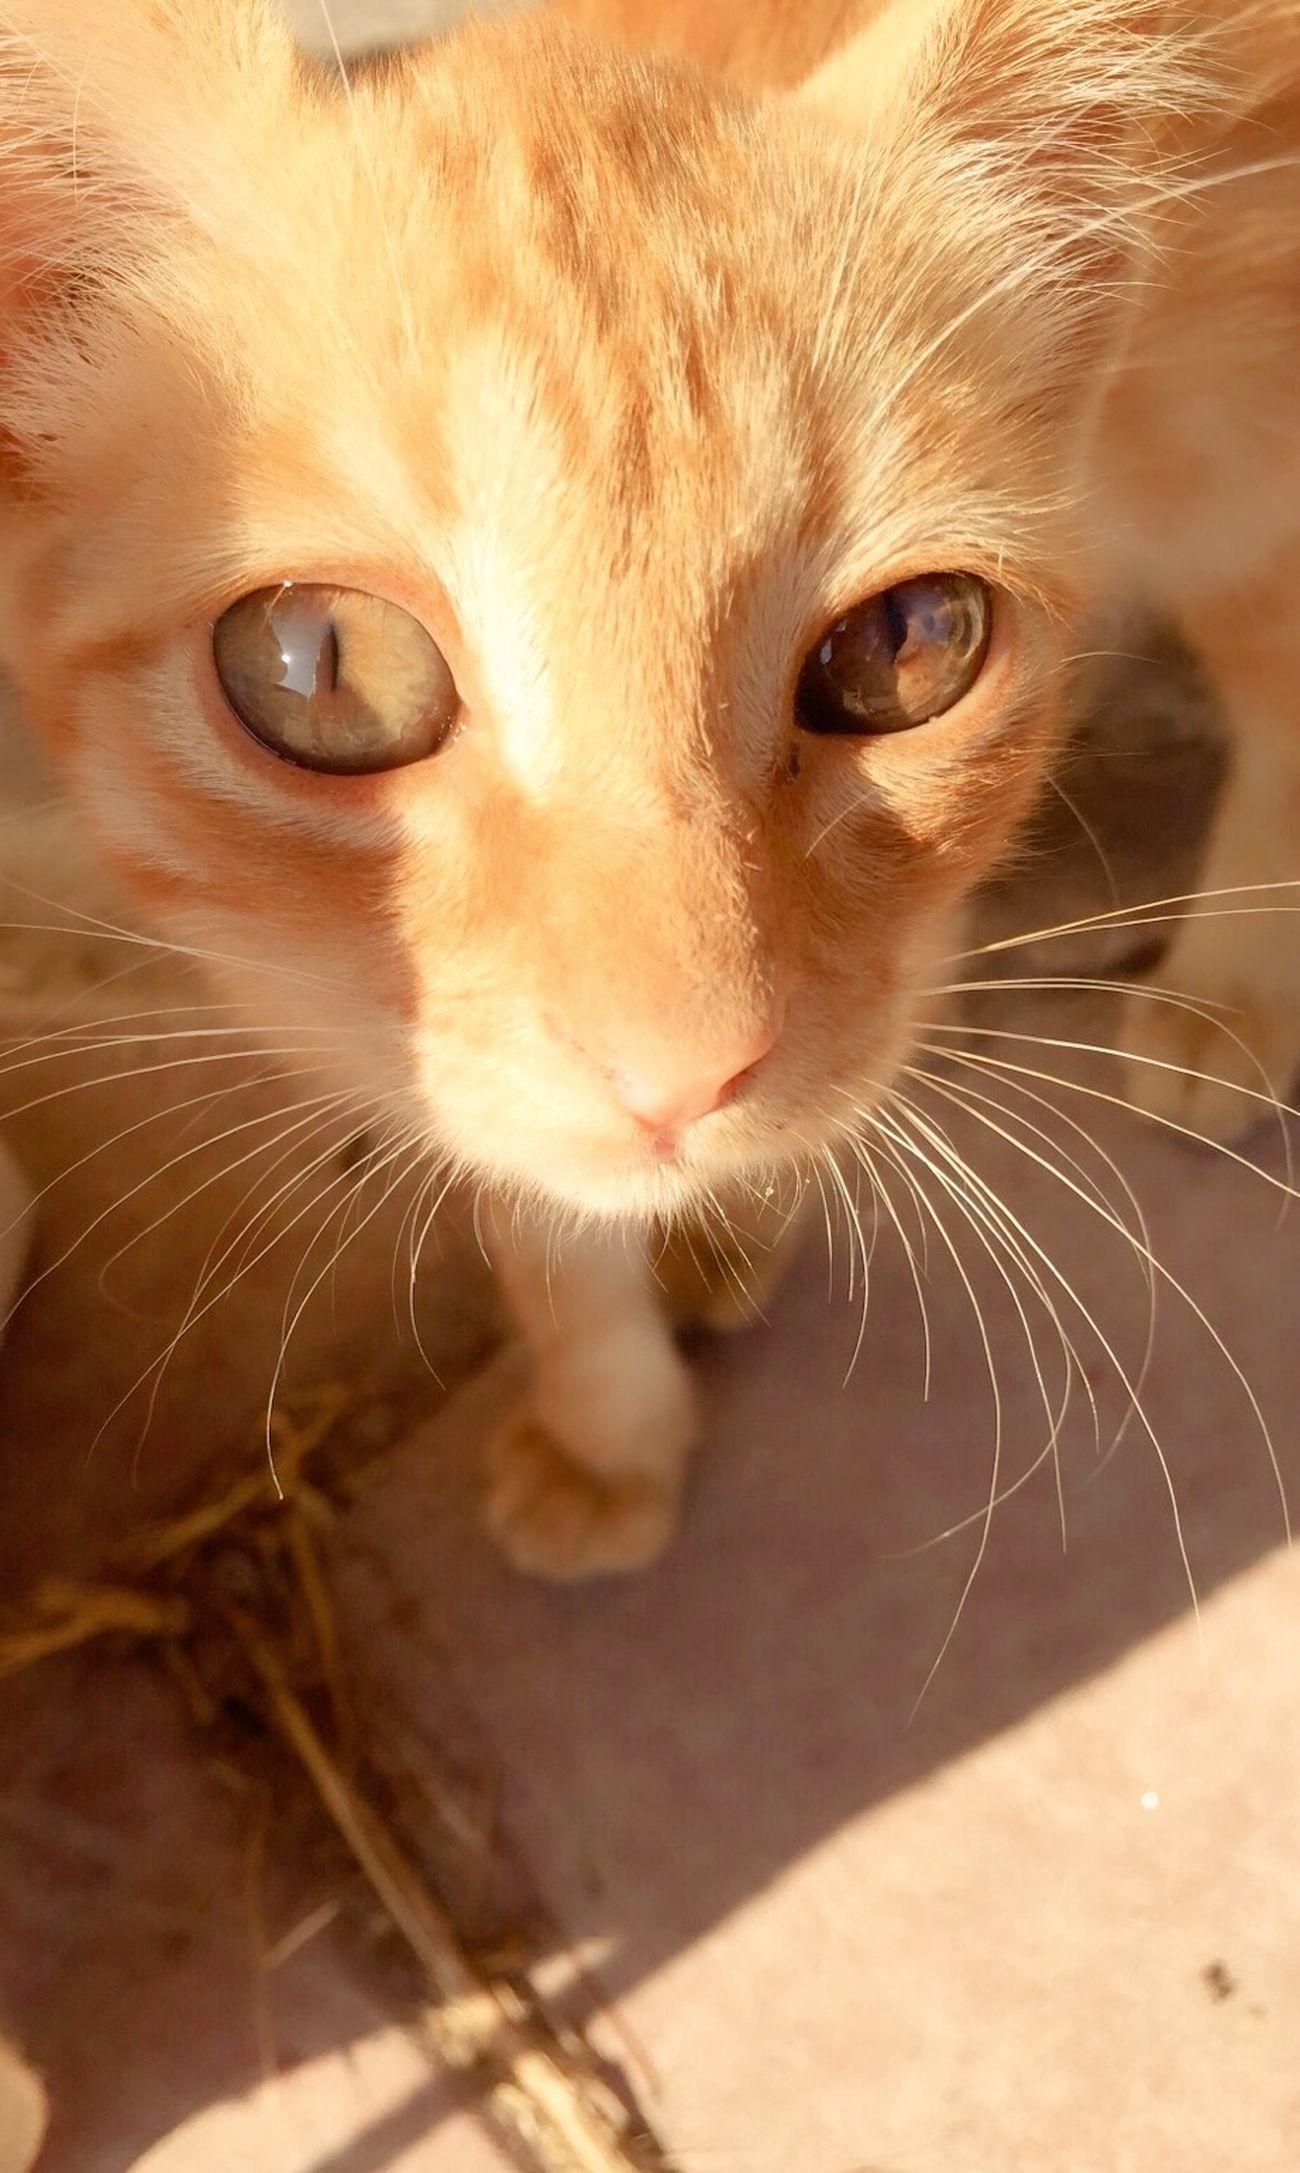 Cat Cat Lovers Cat♡ Catoftheday Cats Catlovers Sunshine Kitty Kitten Taking Photos